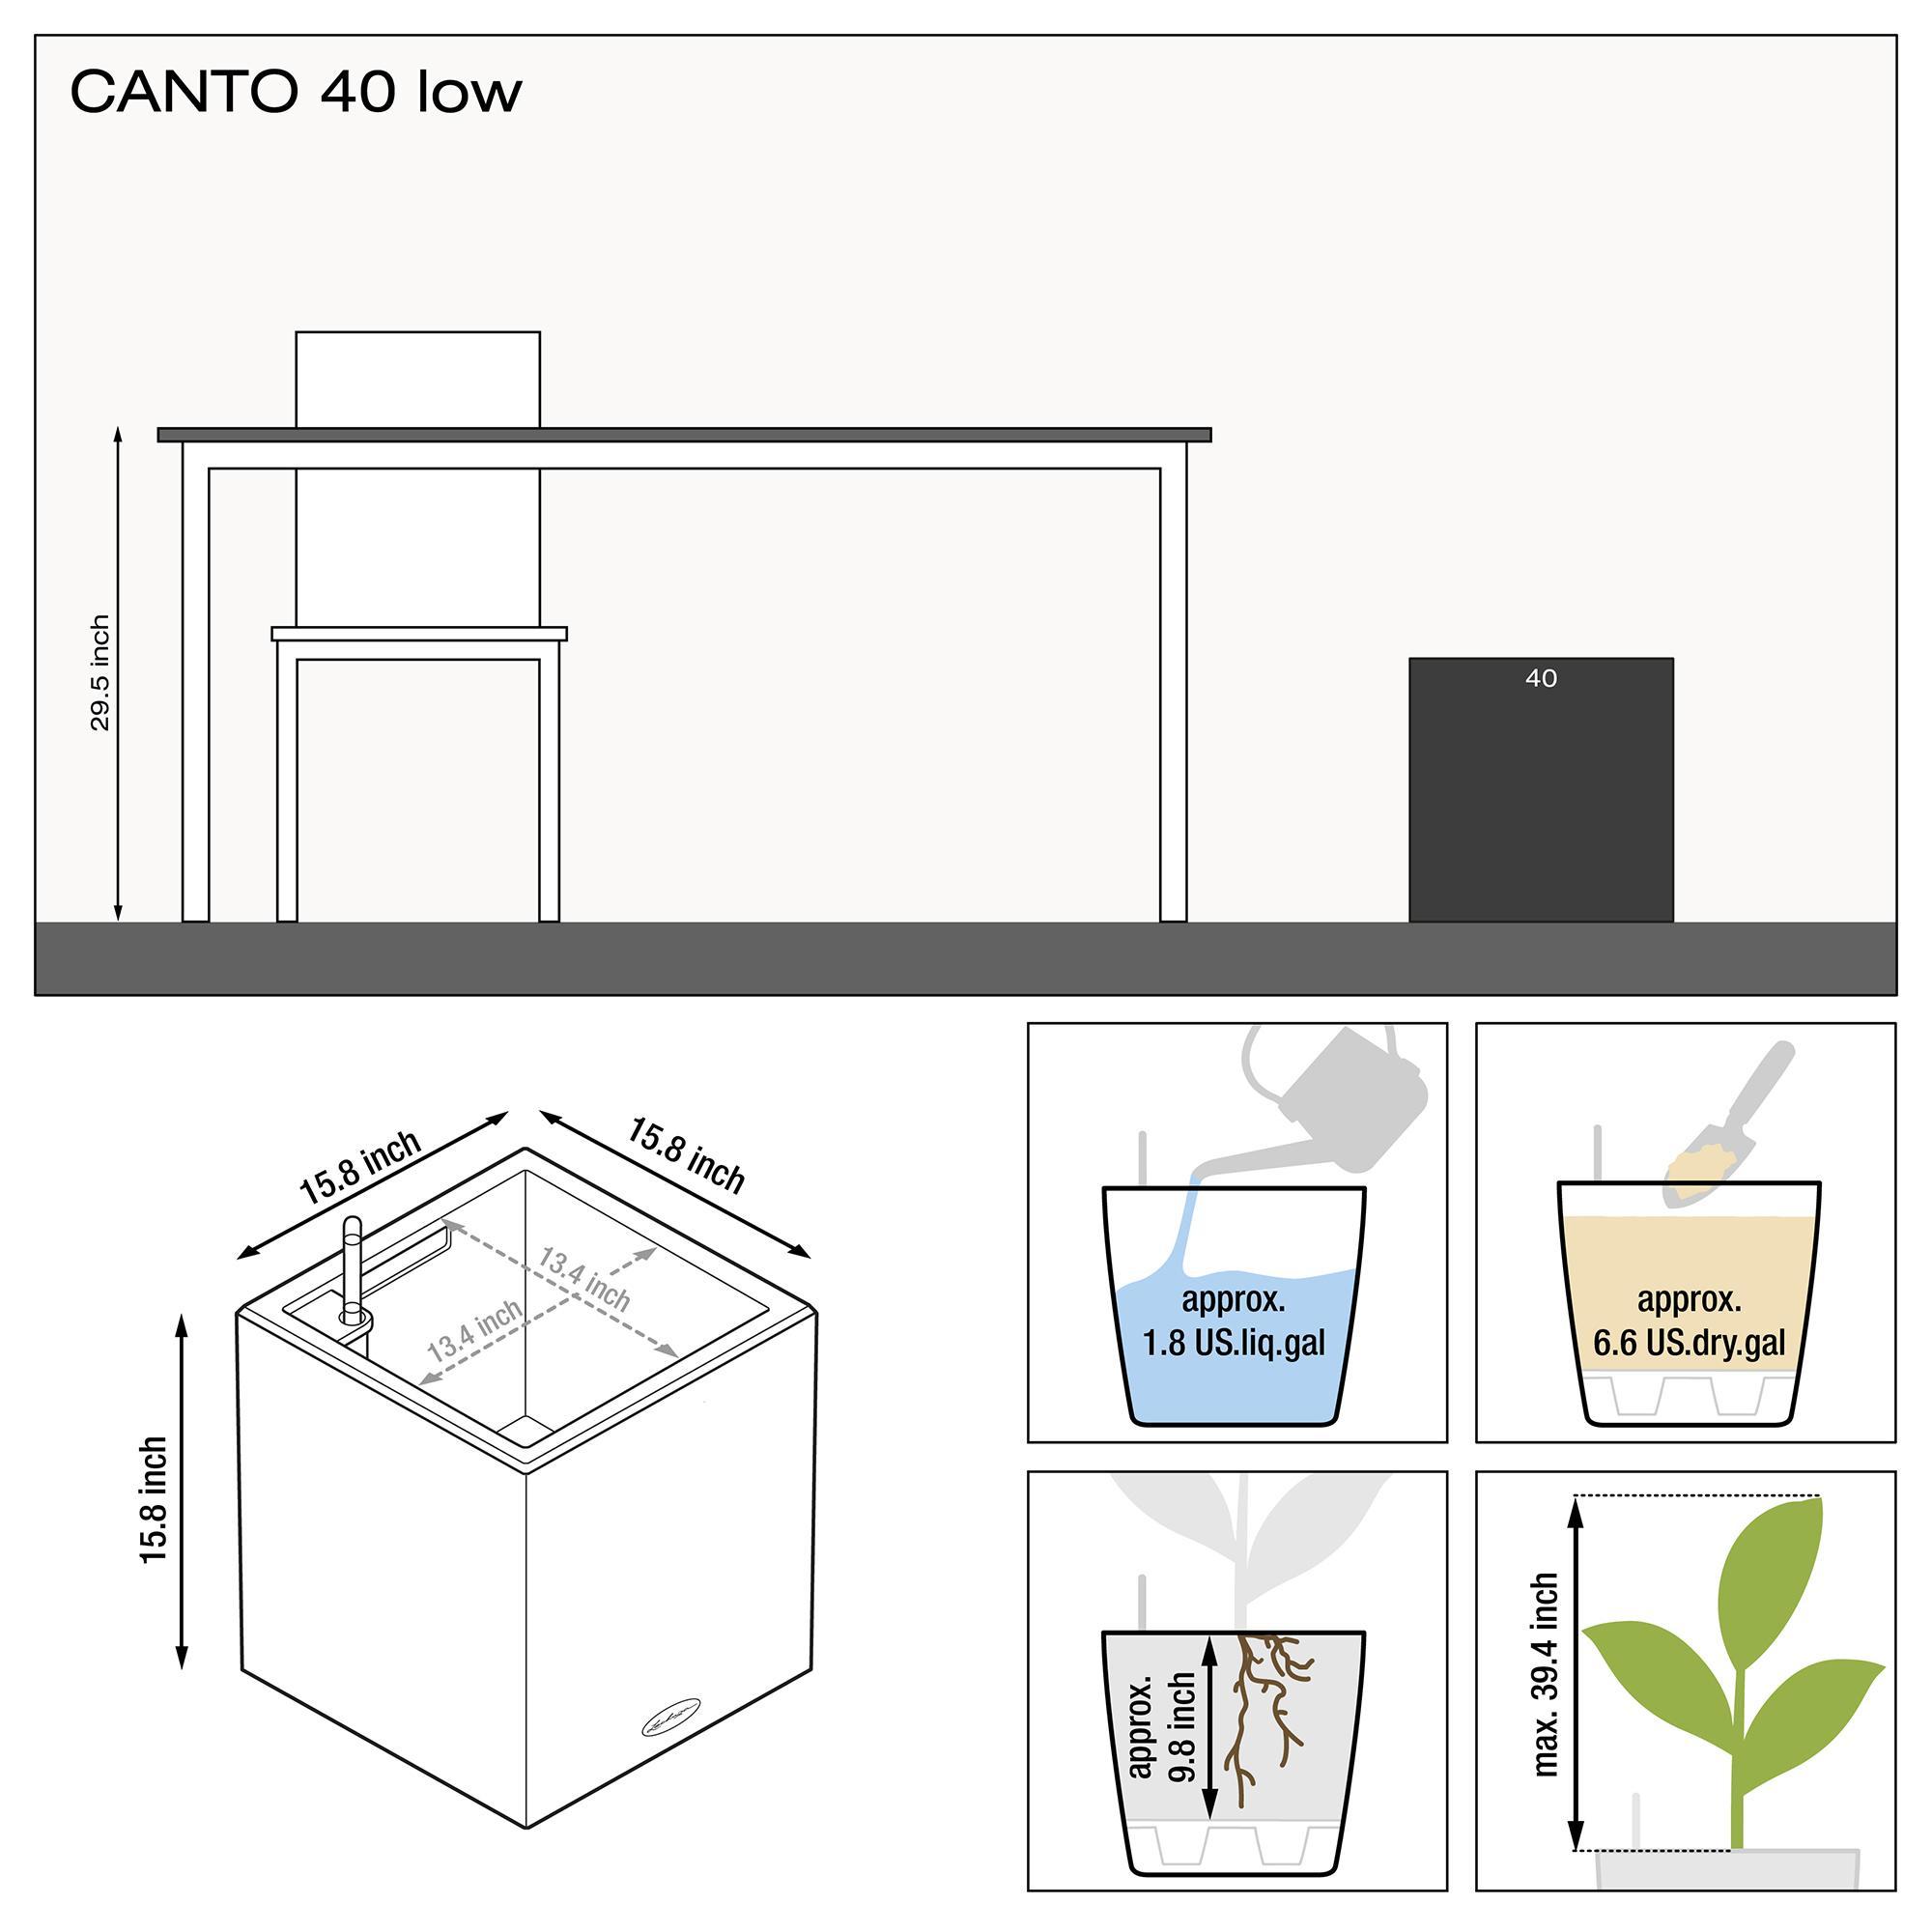 le_canto-wuerfel40_product_addi_nz_us